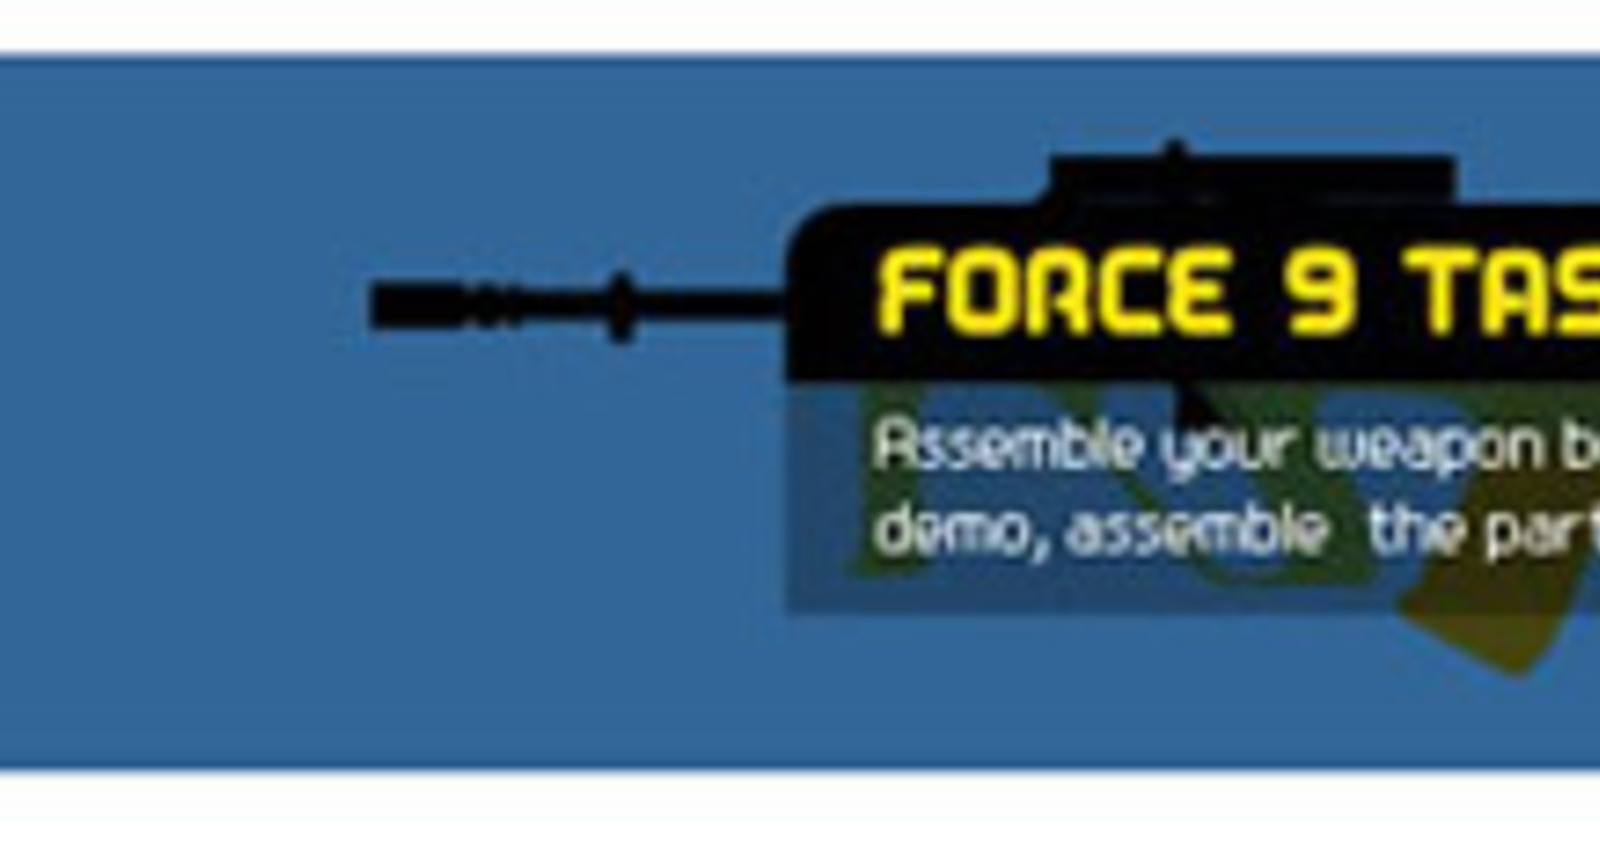 NZ Army Force 9 Rifle